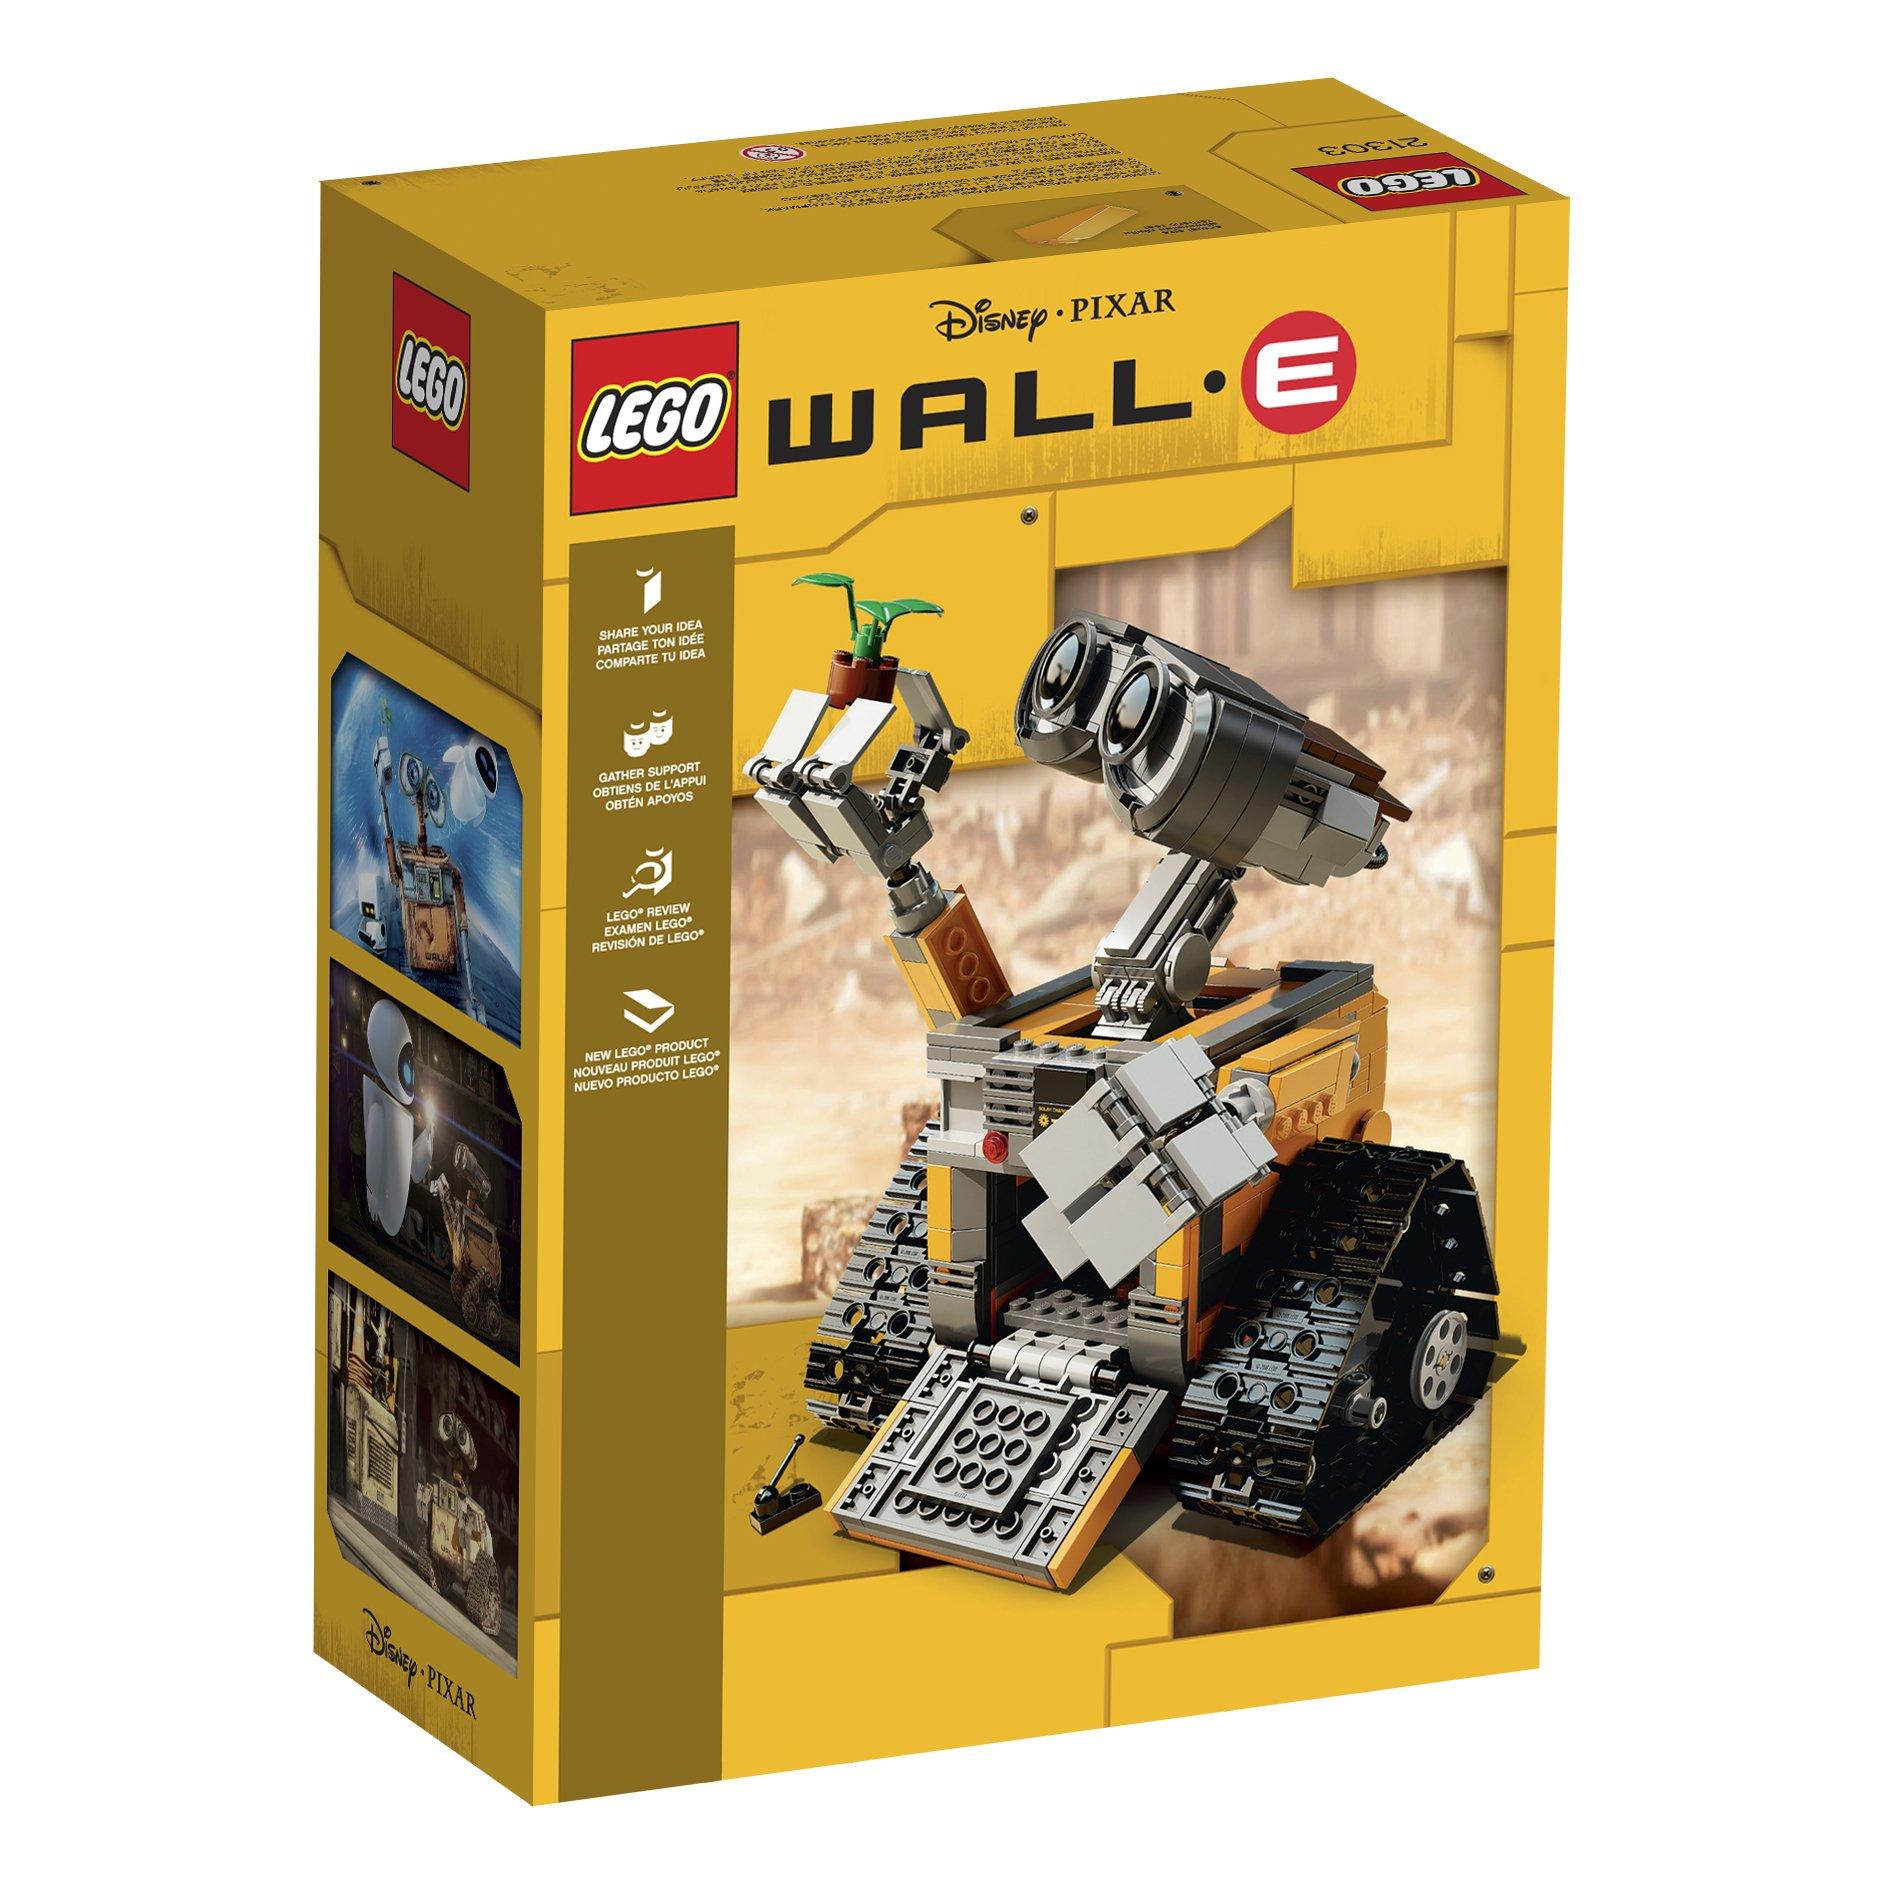 LEGO Ideas WALL E 21303 Building Kit by LEGO (Image #6)